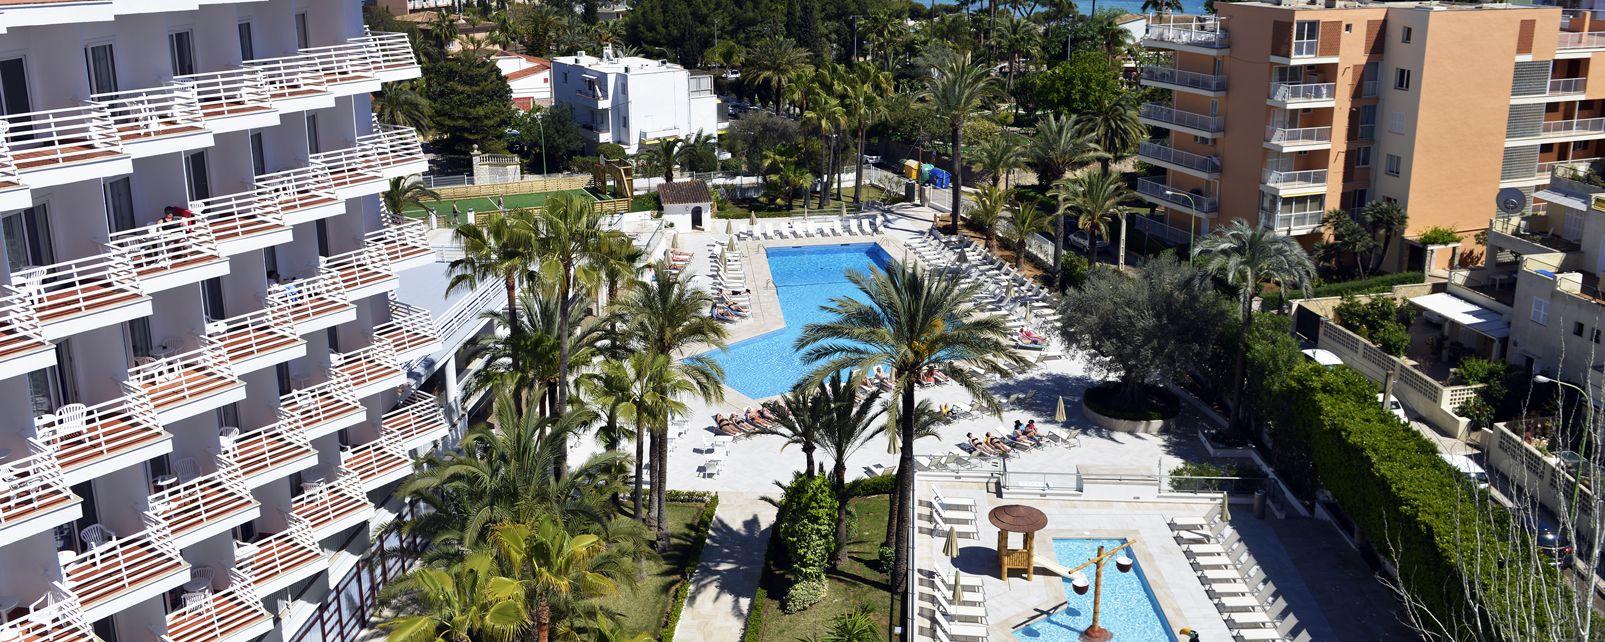 Hotel Club Coralia Palmanova Majorque